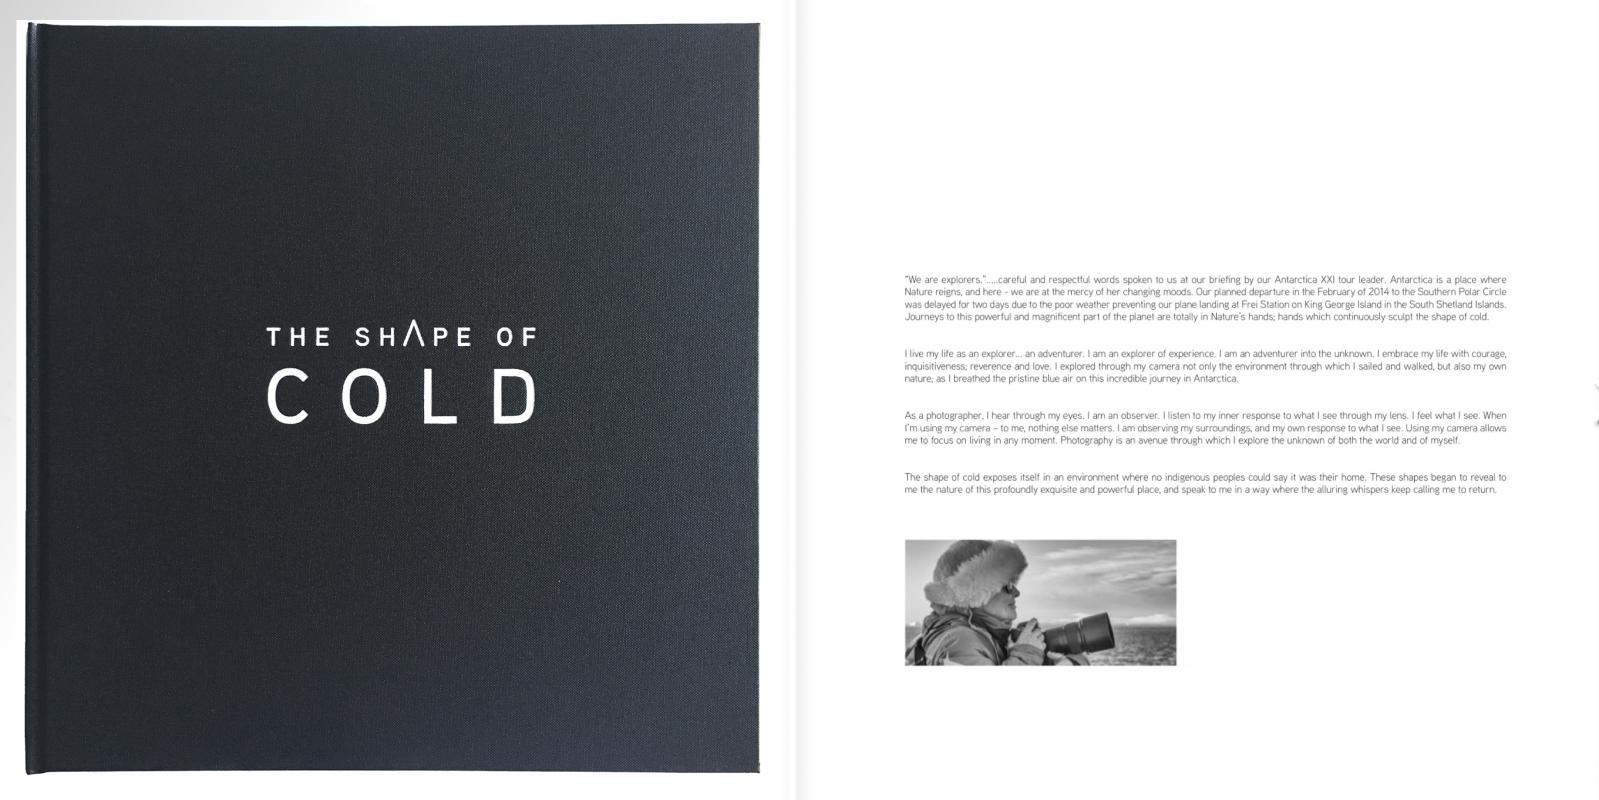 The Shape of Cold, © Julie Stephenson, Australia, 2nd Place, Tokyo International Foto Awards